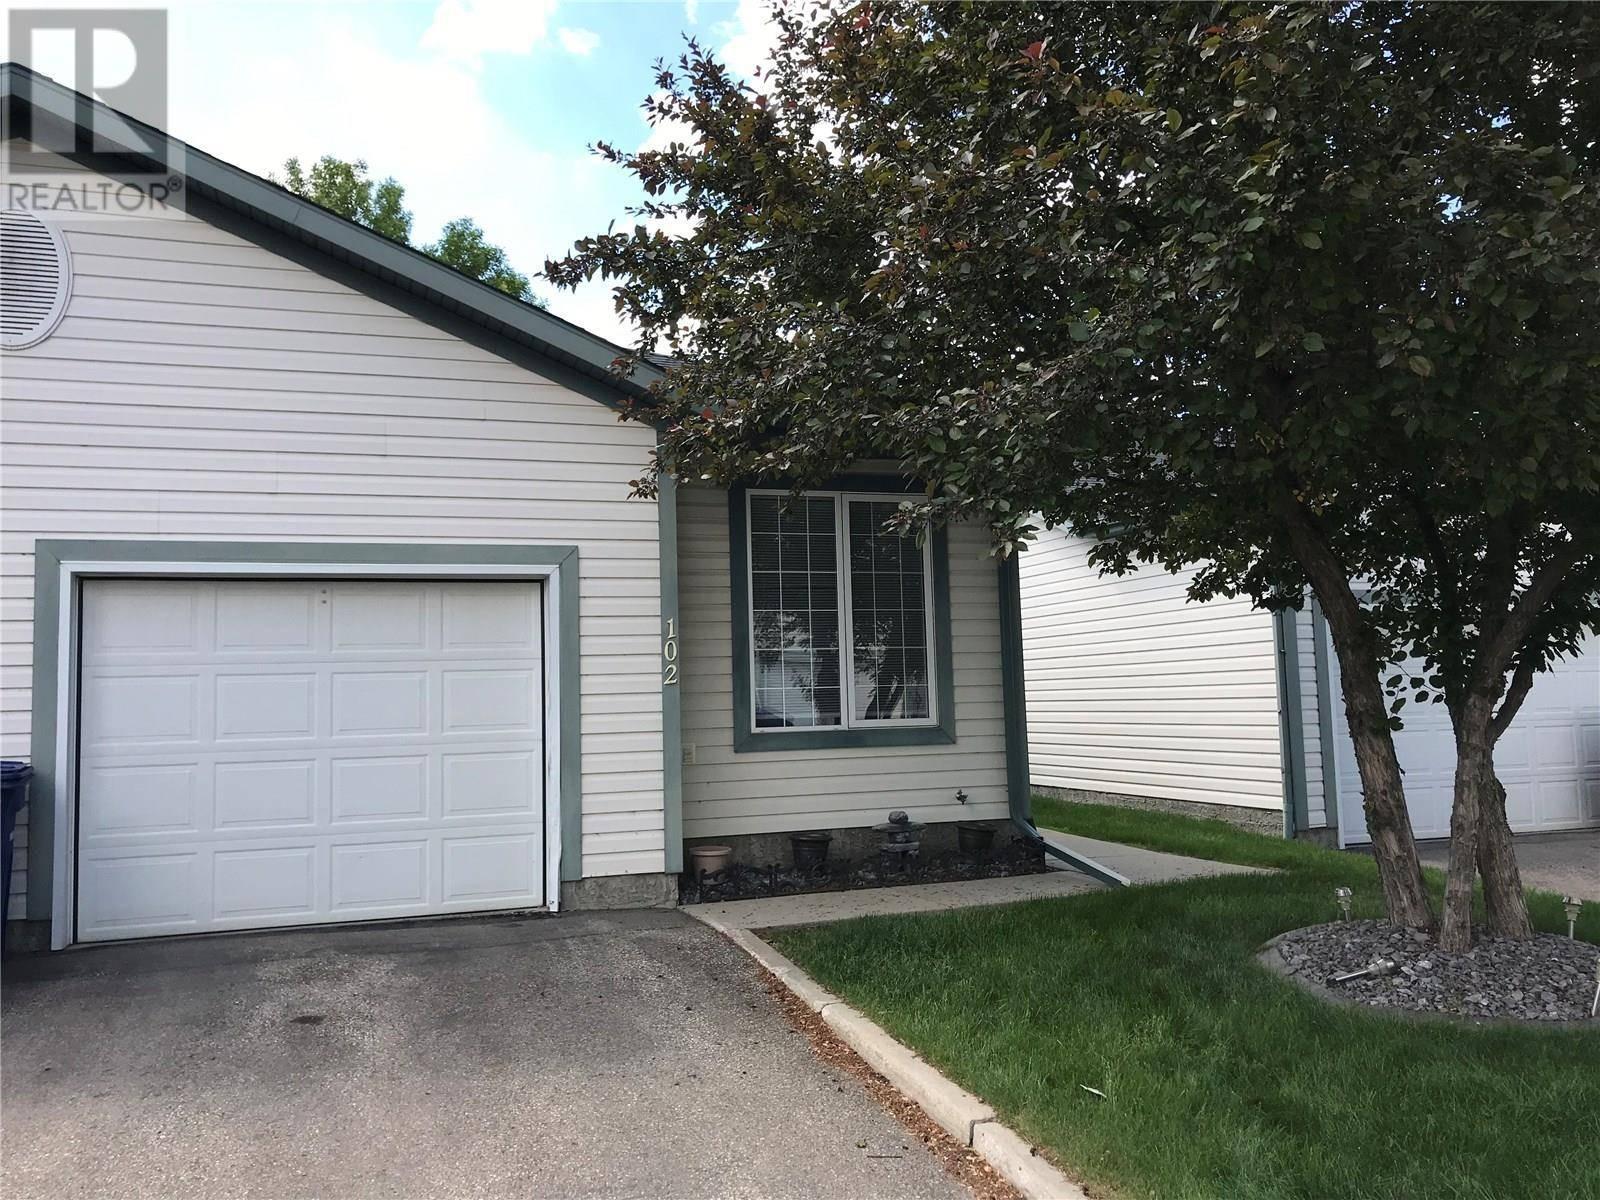 Townhouse for sale at 535 Mcwillie Ave Unit 102 Saskatoon Saskatchewan - MLS: SK781912